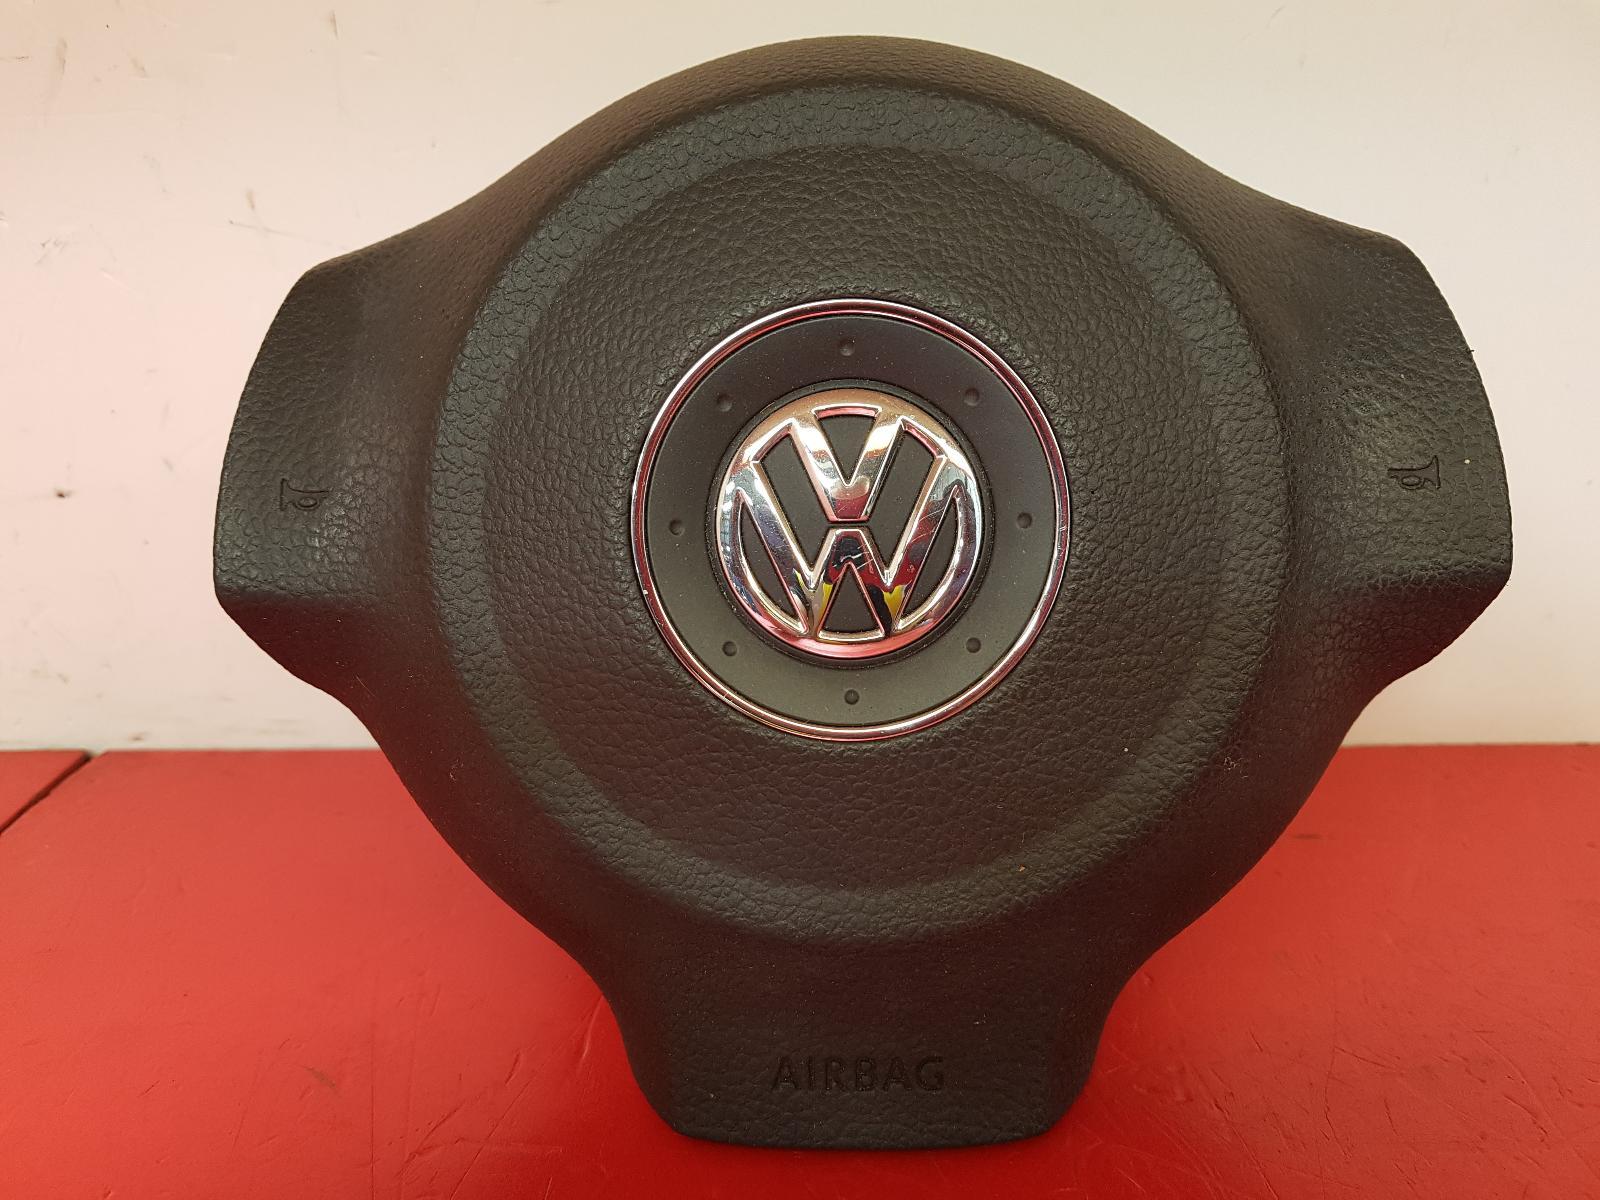 View Auto part R Air Bag Volkswagen Polo 2011